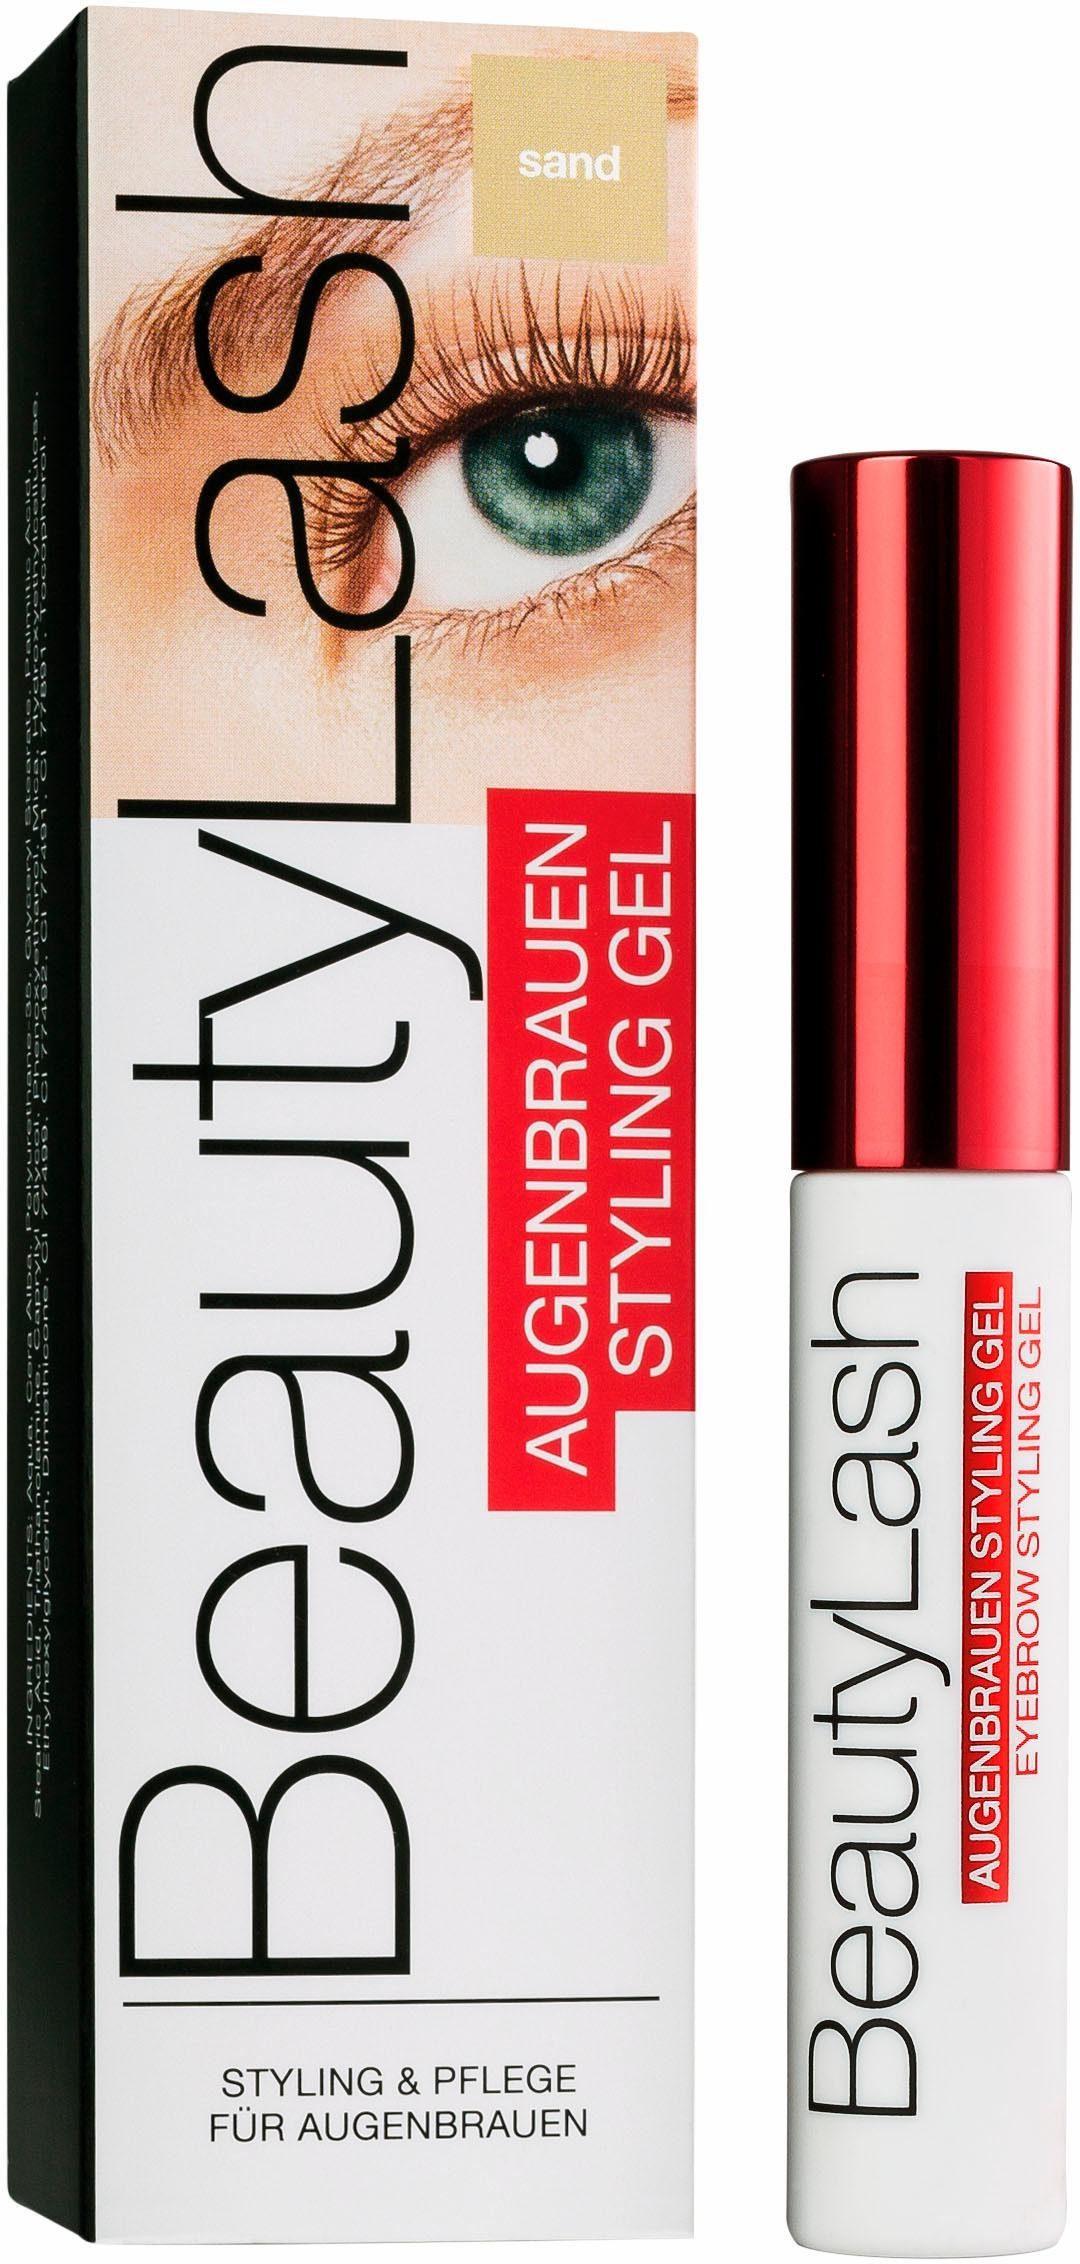 Beauty Lash, »Augenbrauen Styling Gel«, Augenbrauengel